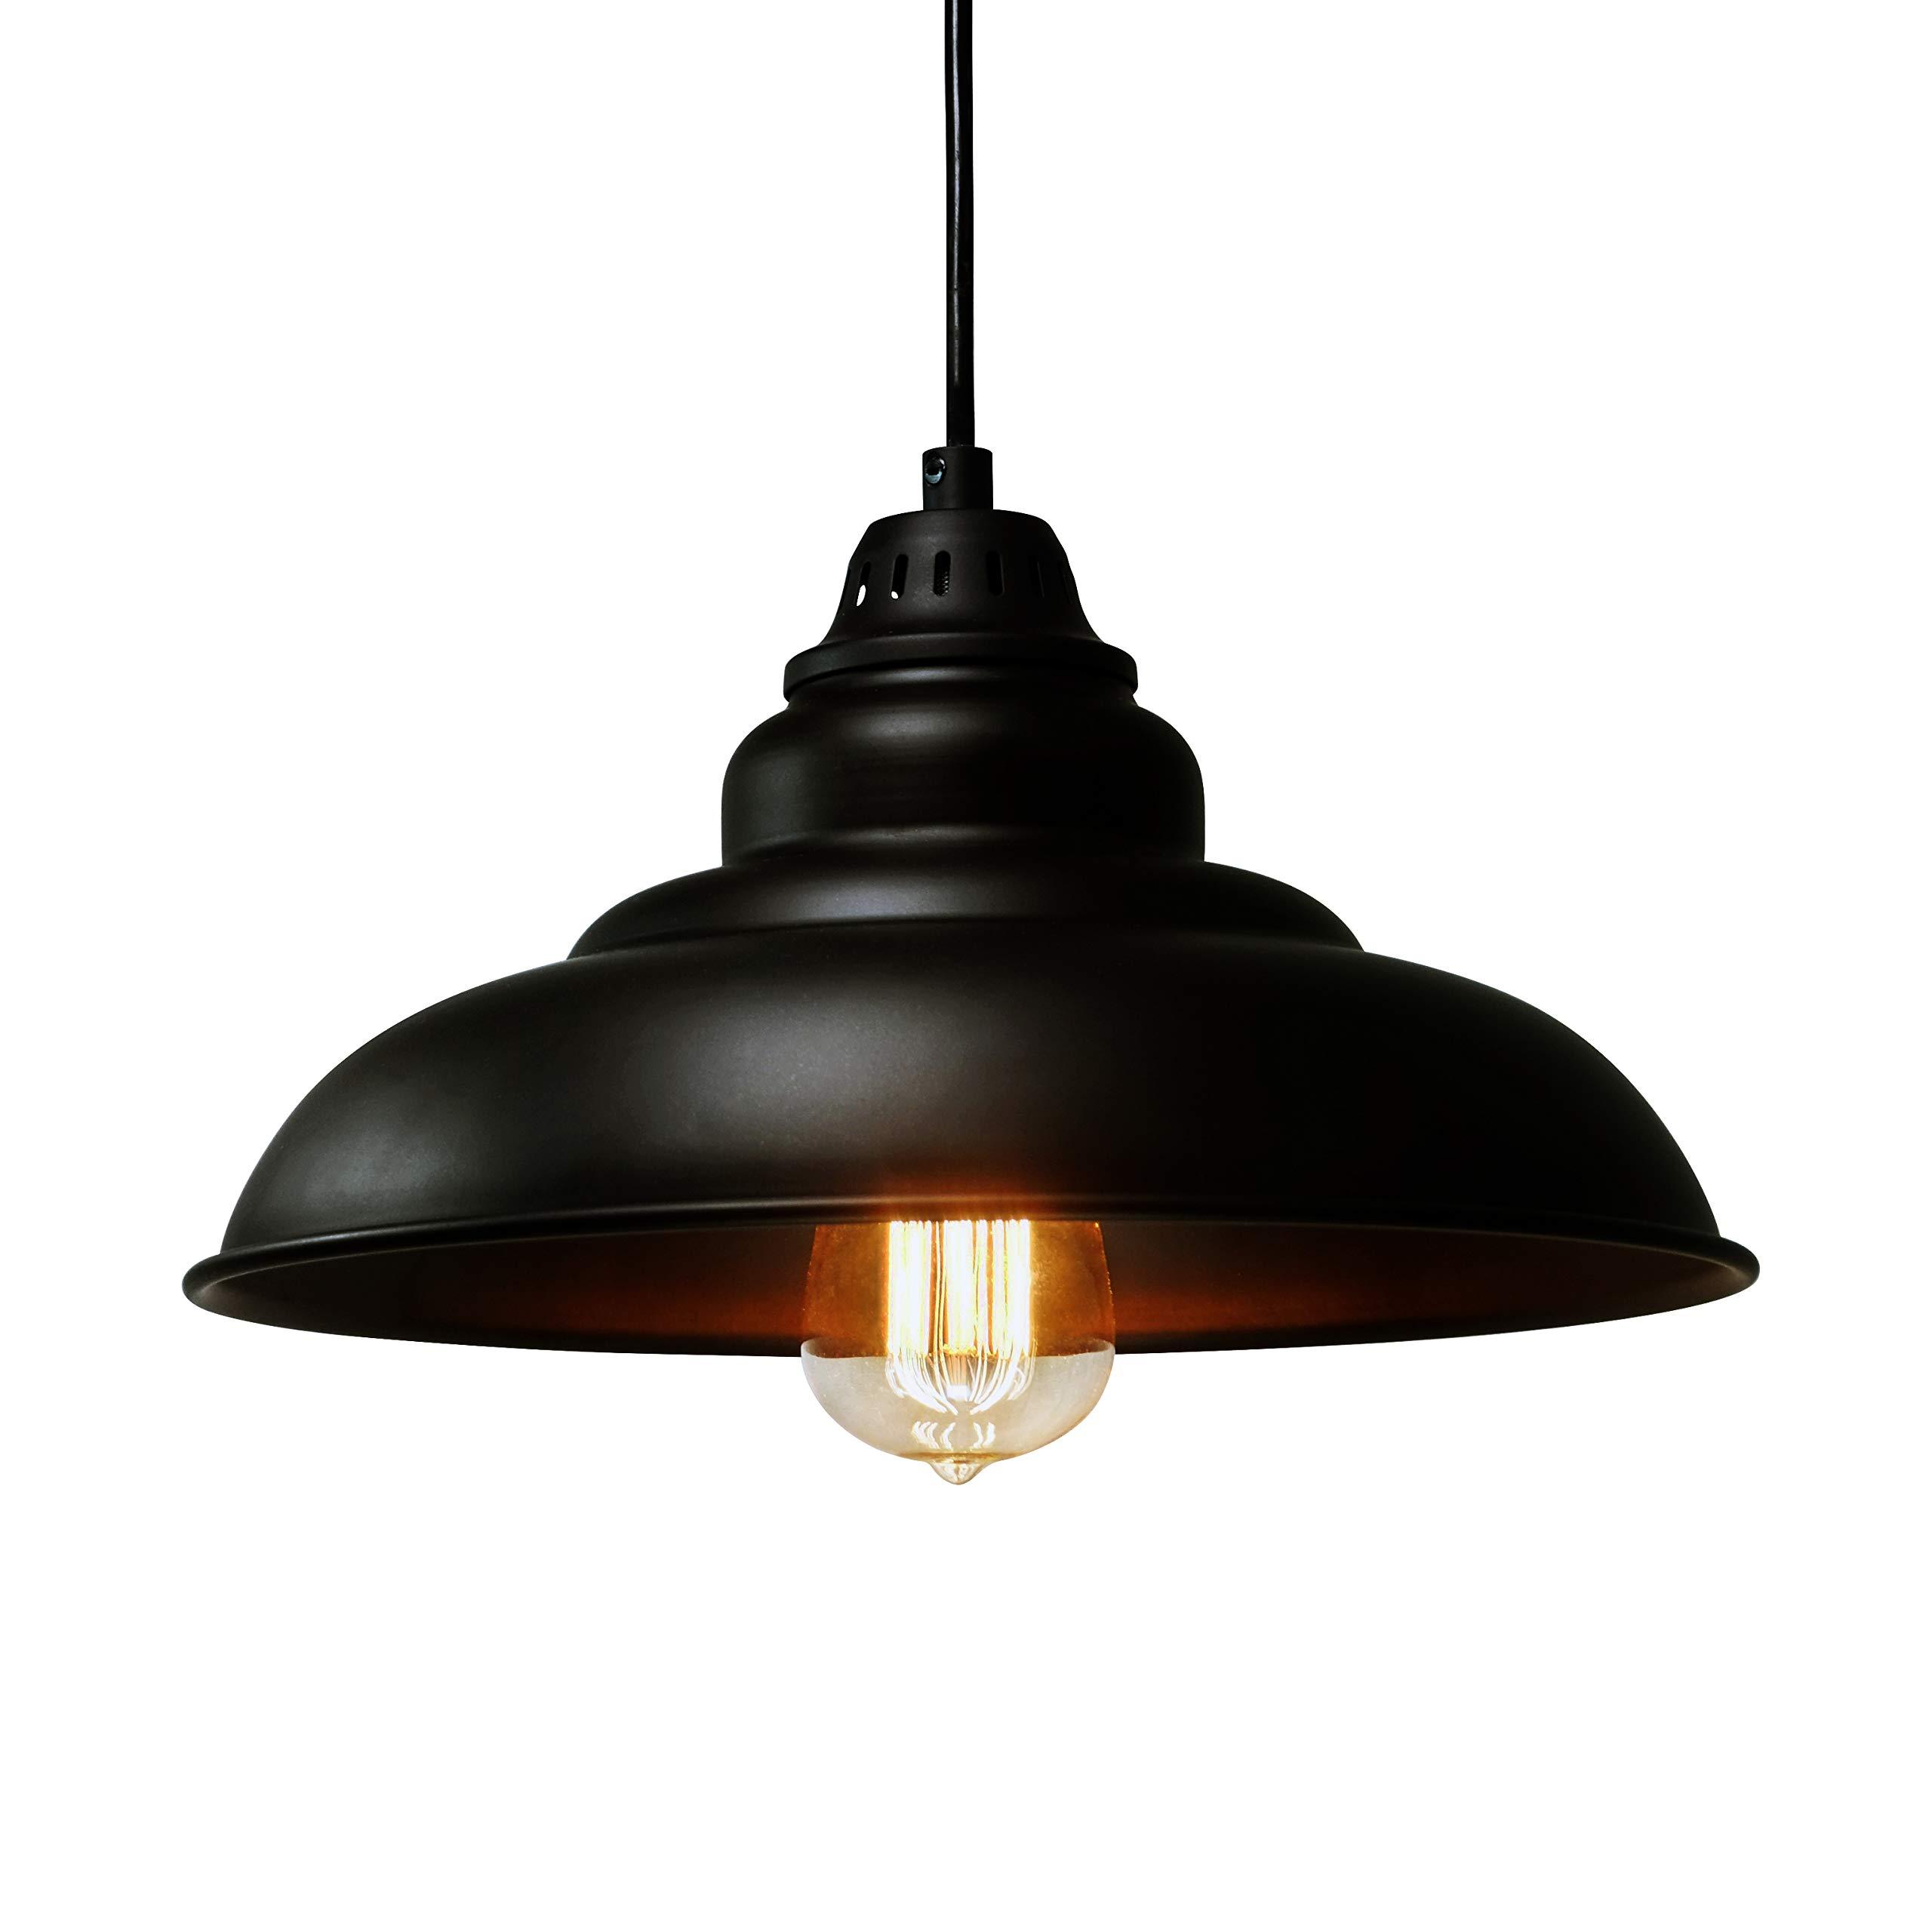 Barn Pendant Lights, FINXIN 1-Light Hanging Light for Kitchen Dining Table FXPL01 Black Bronze 12'' Ceiling Dome Pendant Lighting E26 Base (Black)